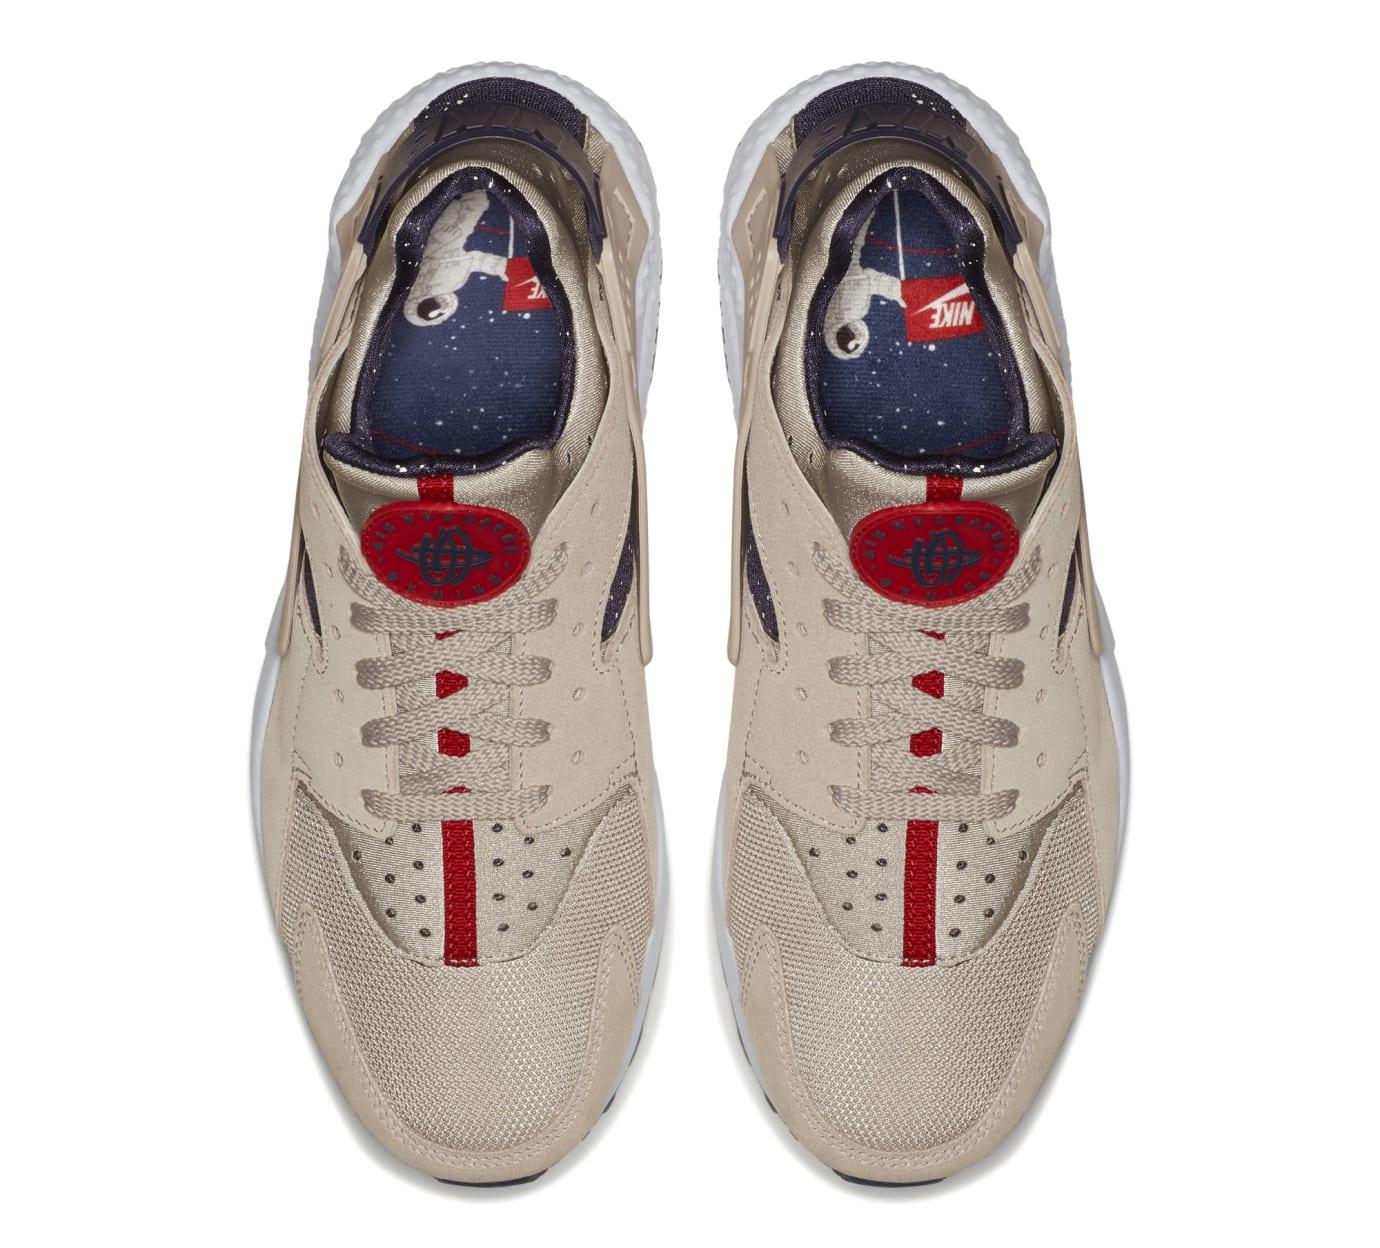 best loved 2ef63 ceb54 Image via Nike Nike Air Huarache Run Moon Landing  AQ0553-200 ... 6cdeec729